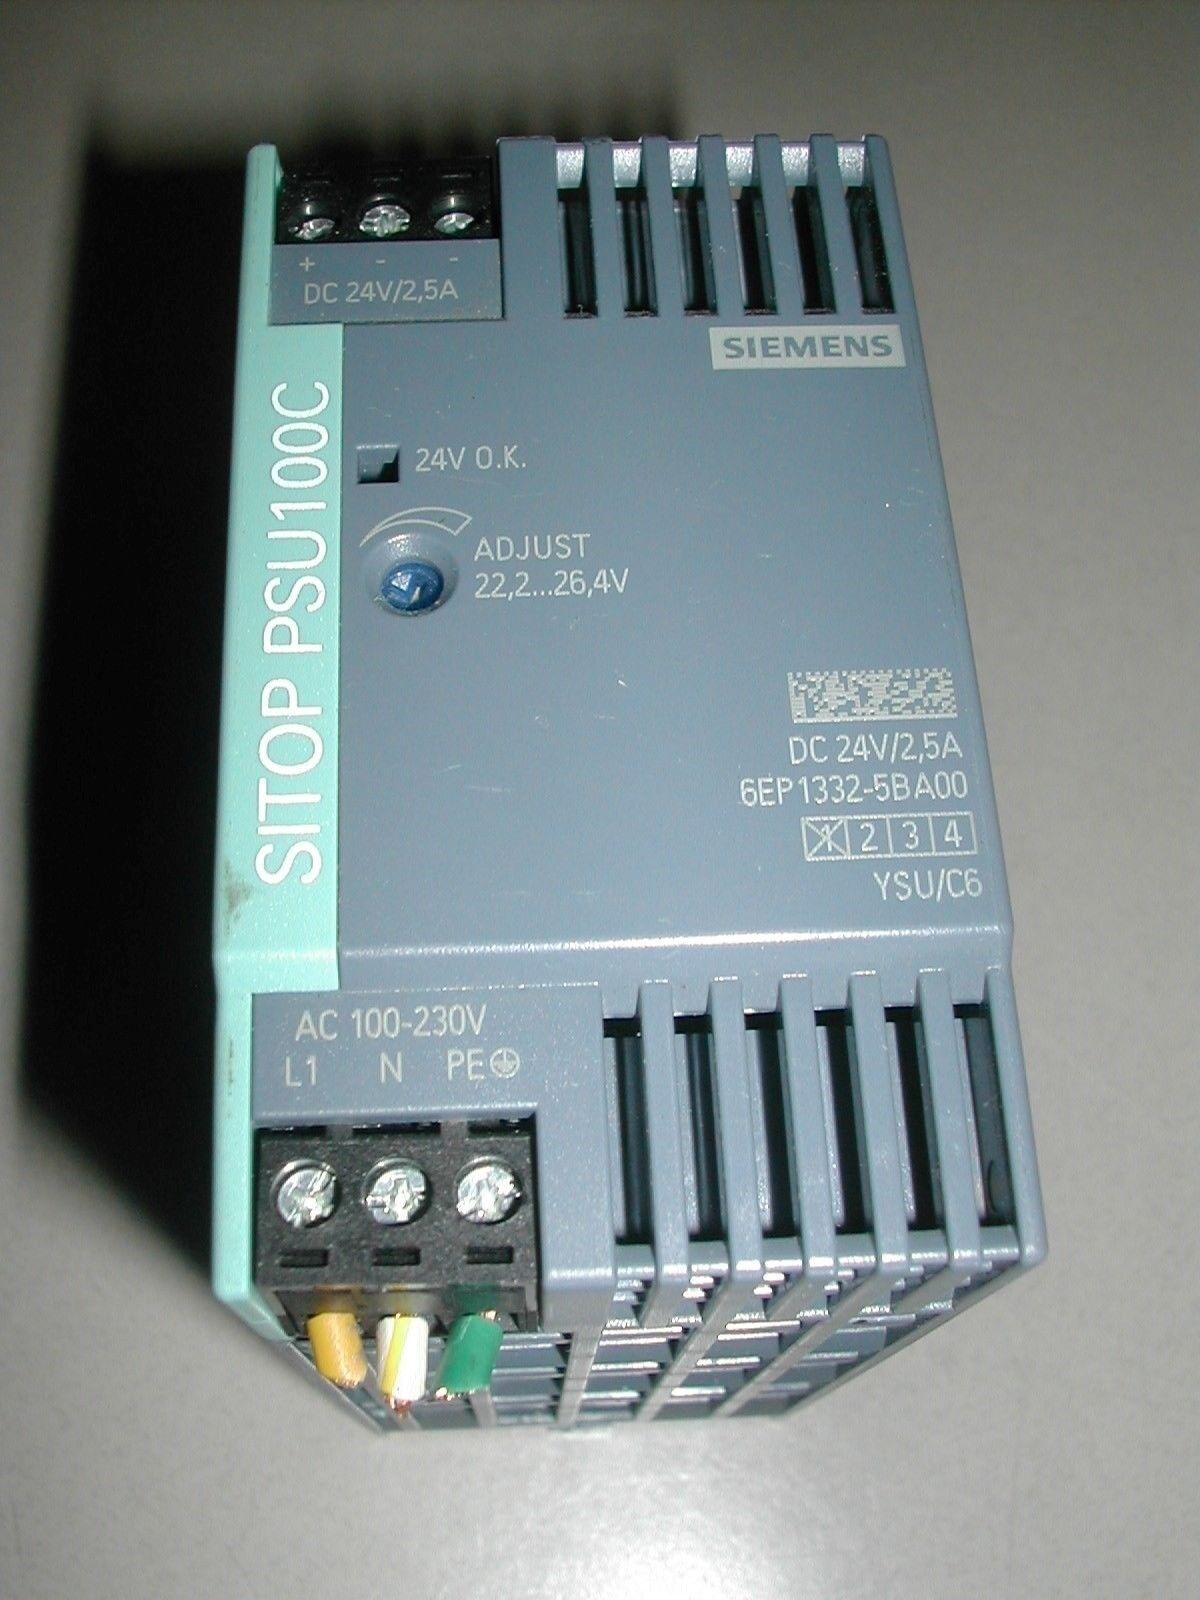 SIEMENS SITOP STABILIZED DC POWER SUPPLY INPUT 6EP1332-5BA00   PSU100C USED E7